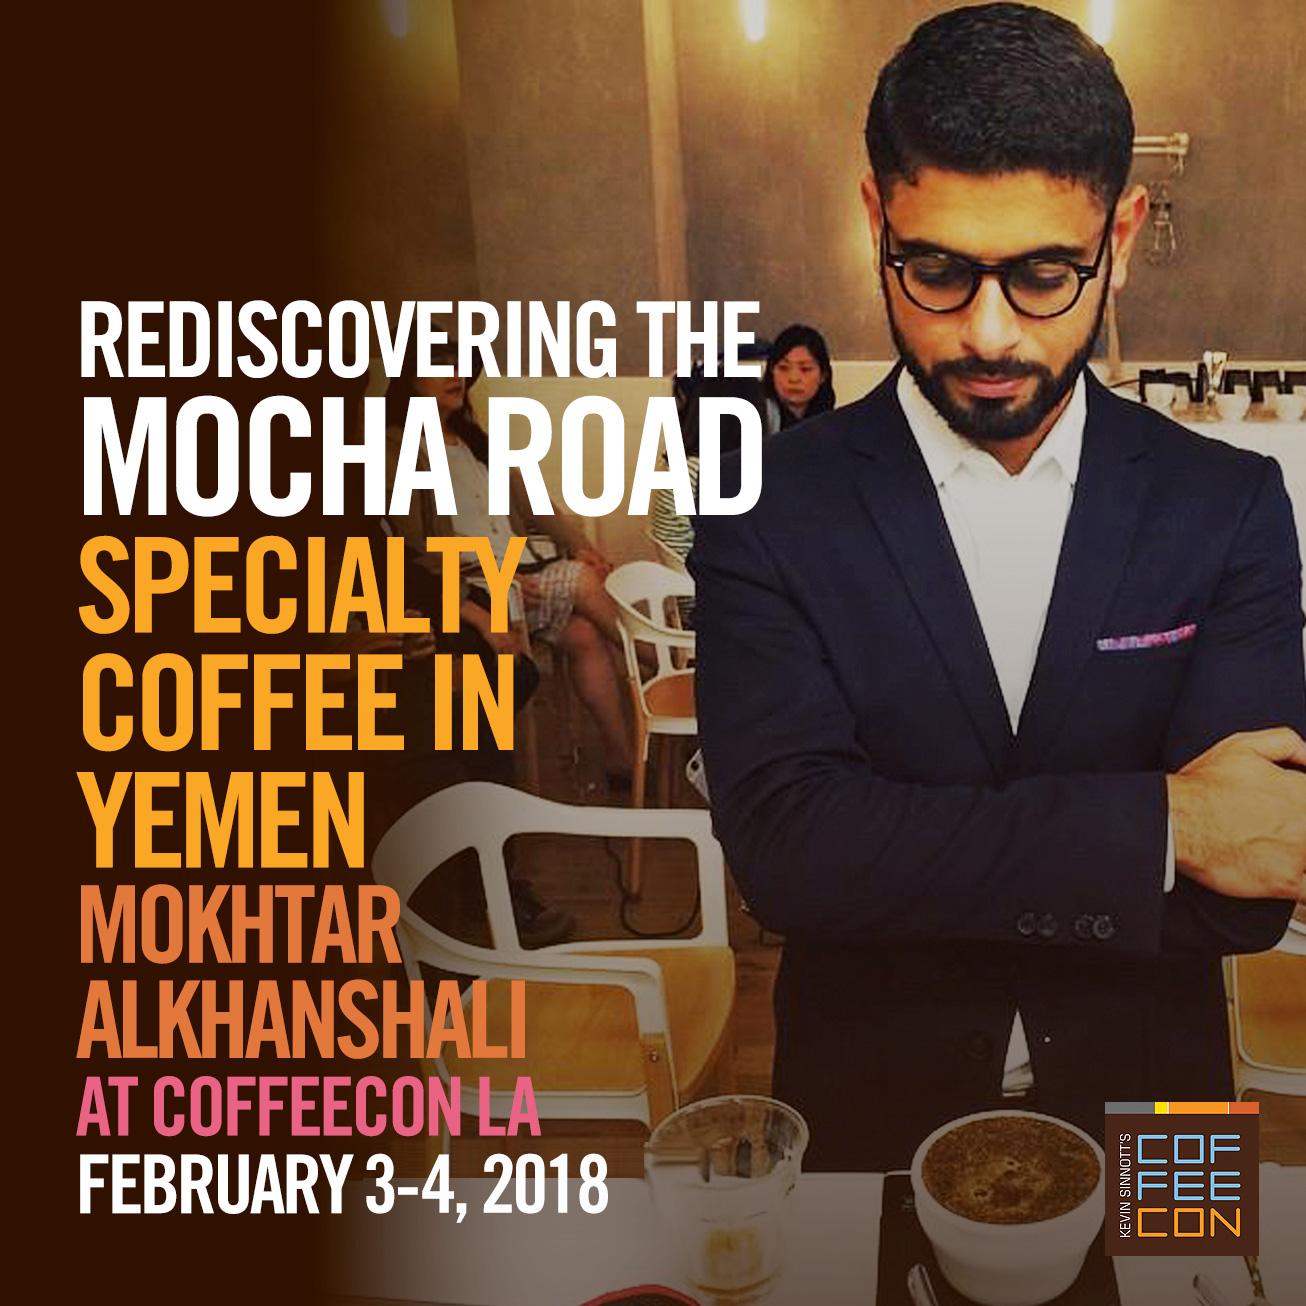 The Road to Mocha: Rediscovering Yemen with Mokhtar Alkhanshali at CoffeeConLA 2018